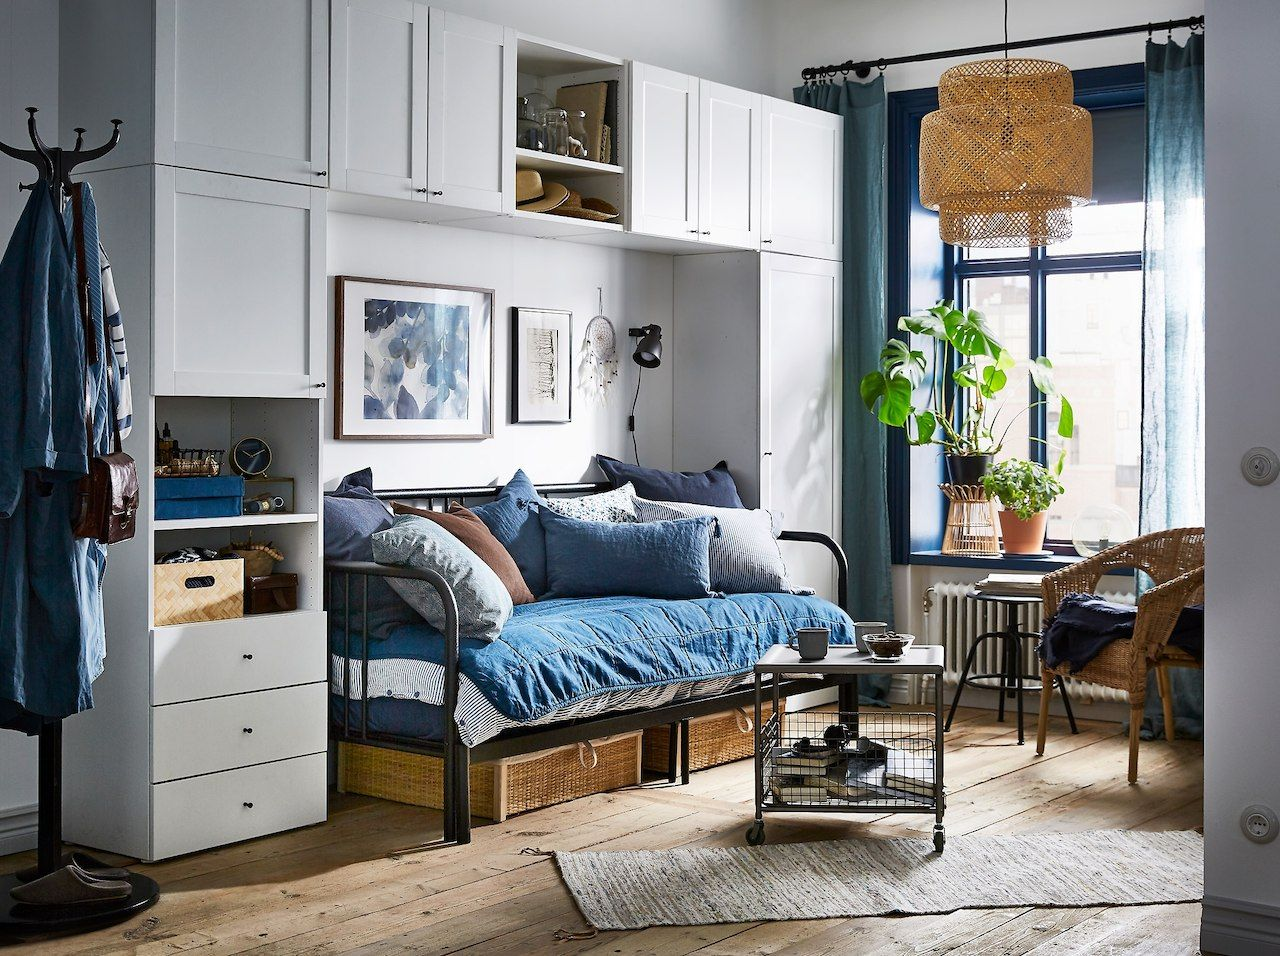 A Gallery Of Bedroom Inspiration Unique Bedroom Design Bedroom Design Ikea Bedroom Ikea platsa bedroom ideas